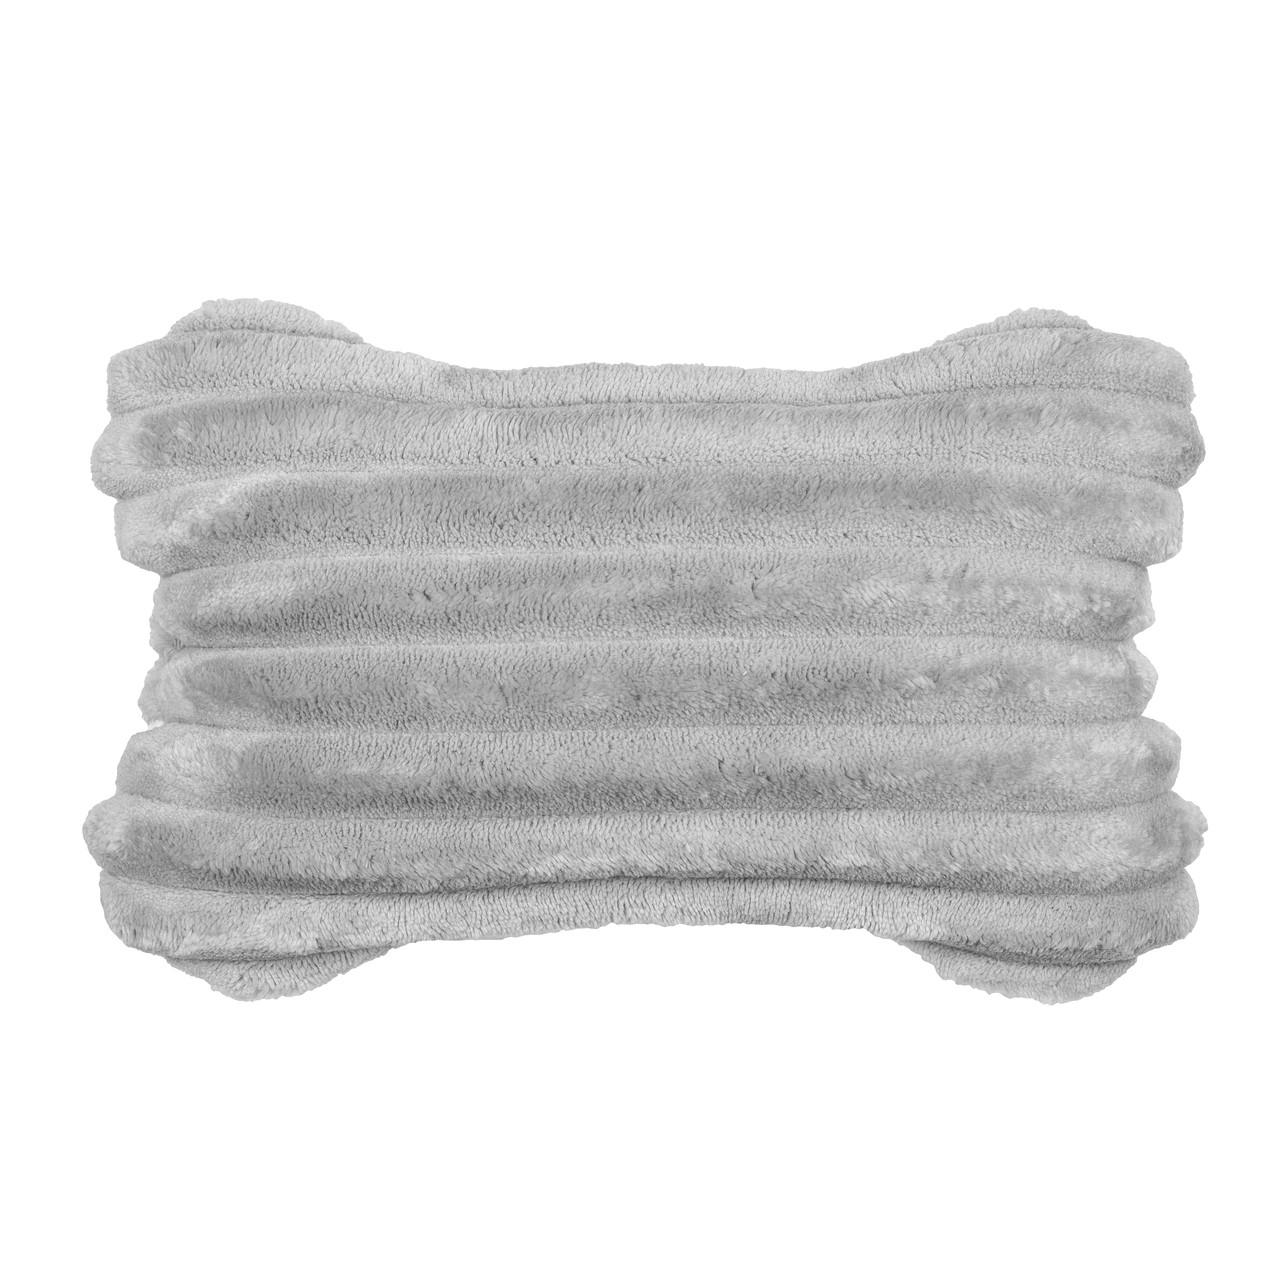 Подушка DRÖM Luxury косточка для автомобиля Серый (10401)